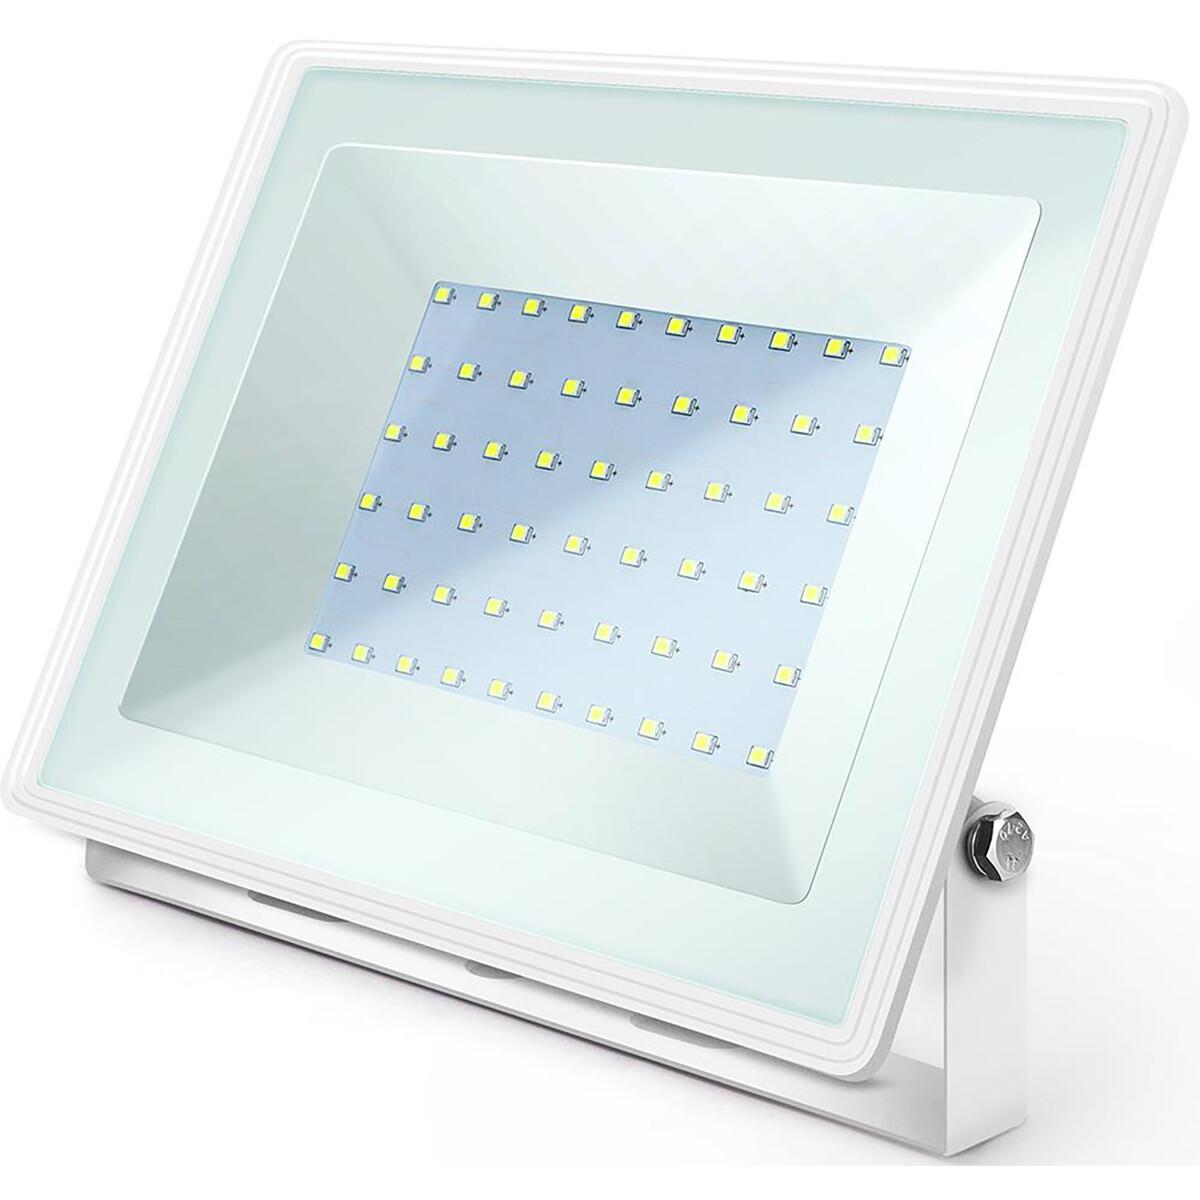 LED Bouwlamp 50 Watt - LED Schijnwerper - Aigi Iglo - Helder/Koud Wit 6400K - Waterdicht IP65 - Mat Wit - Aluminium